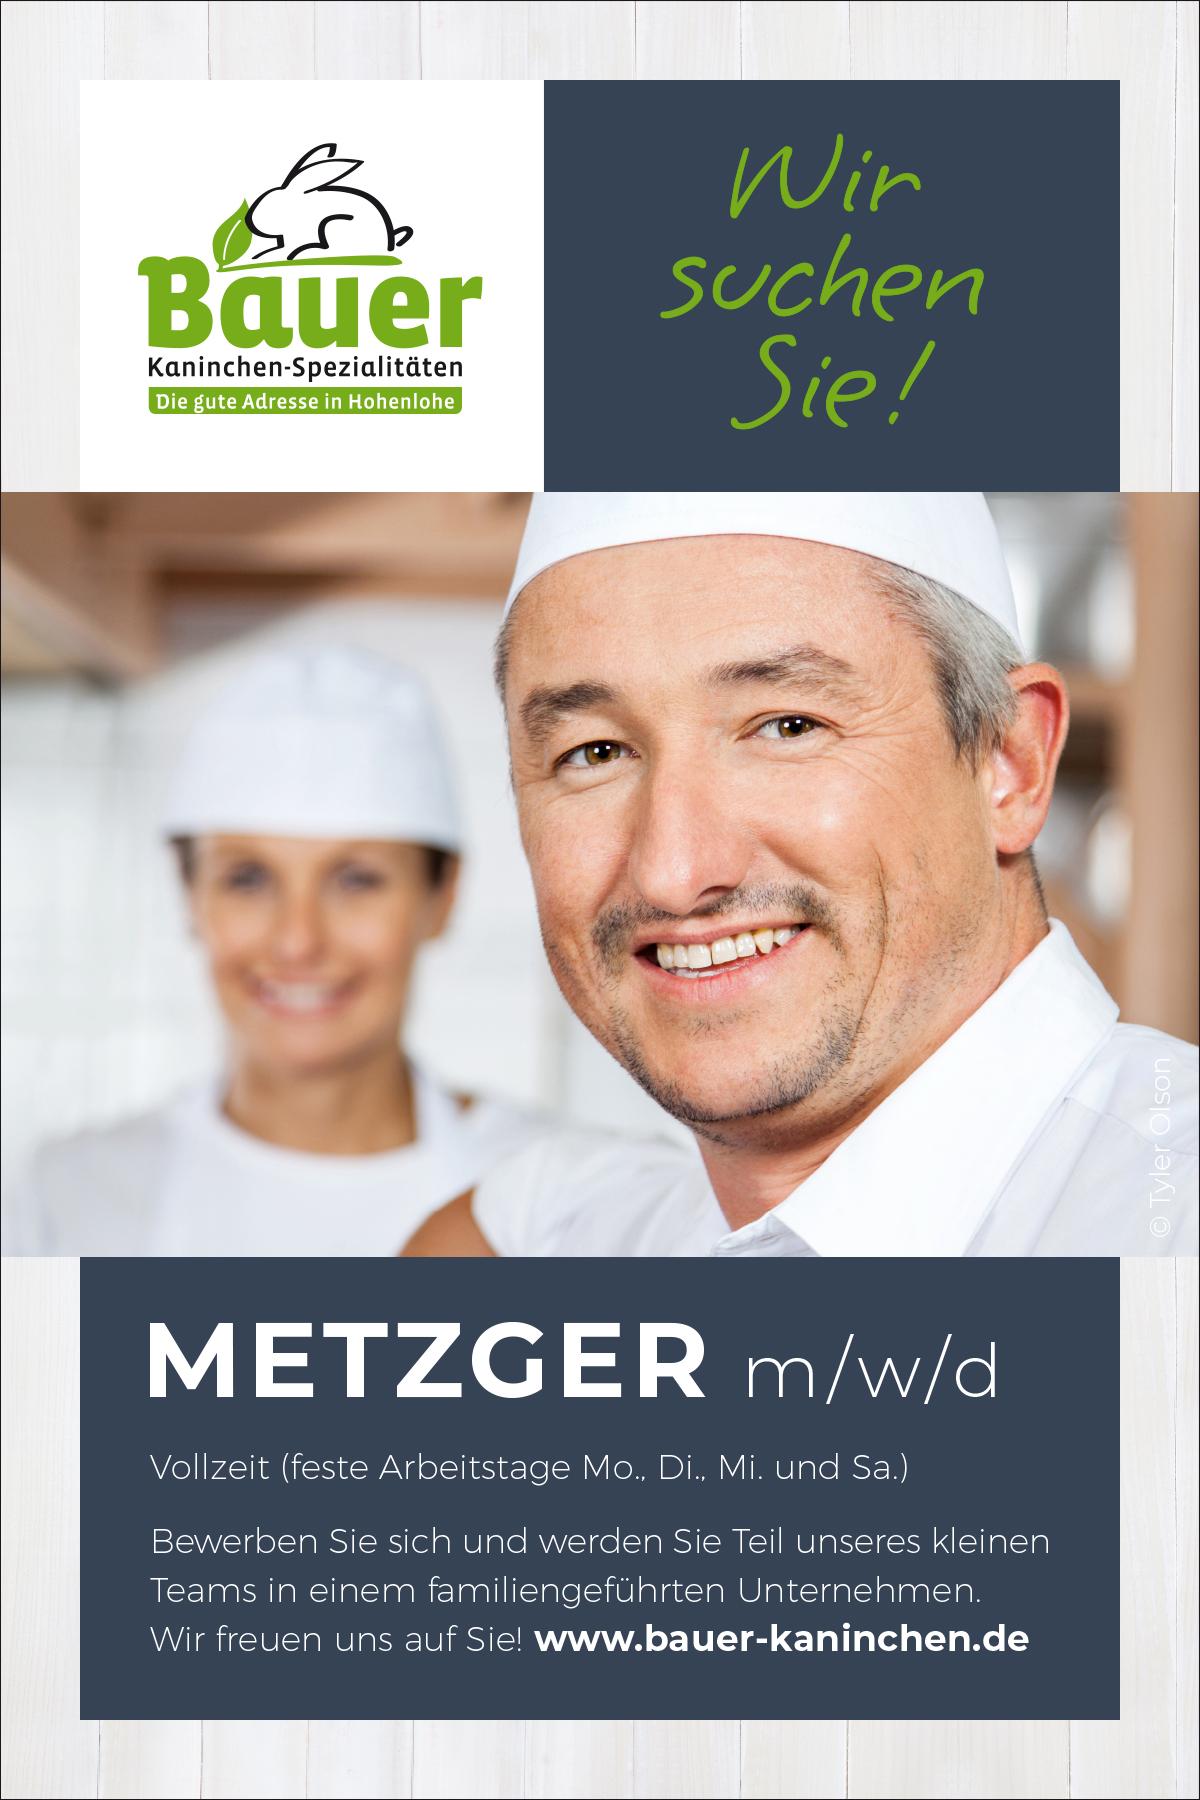 hr-metzger-1200x1800px